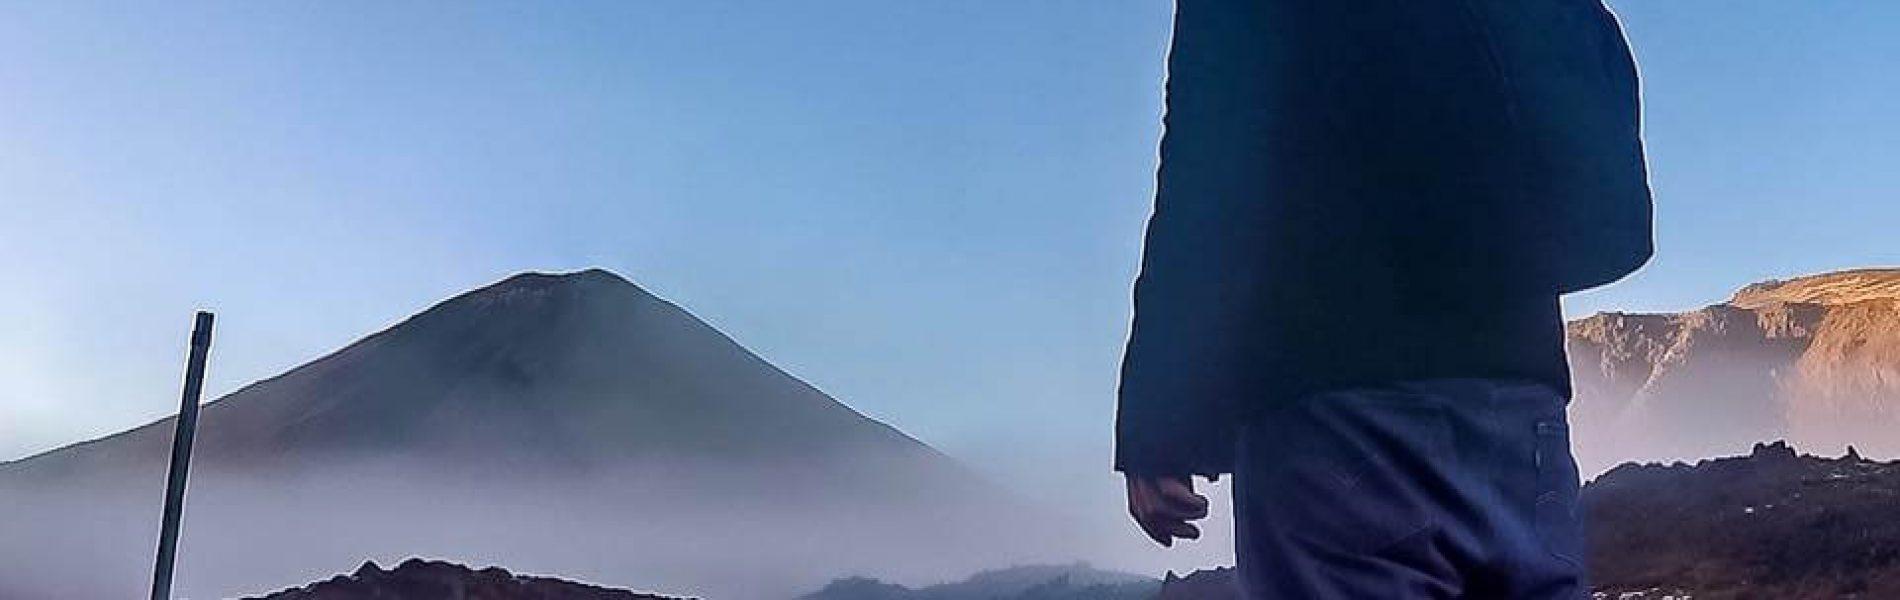 Mt Doom Tongariro Alpine Crossing